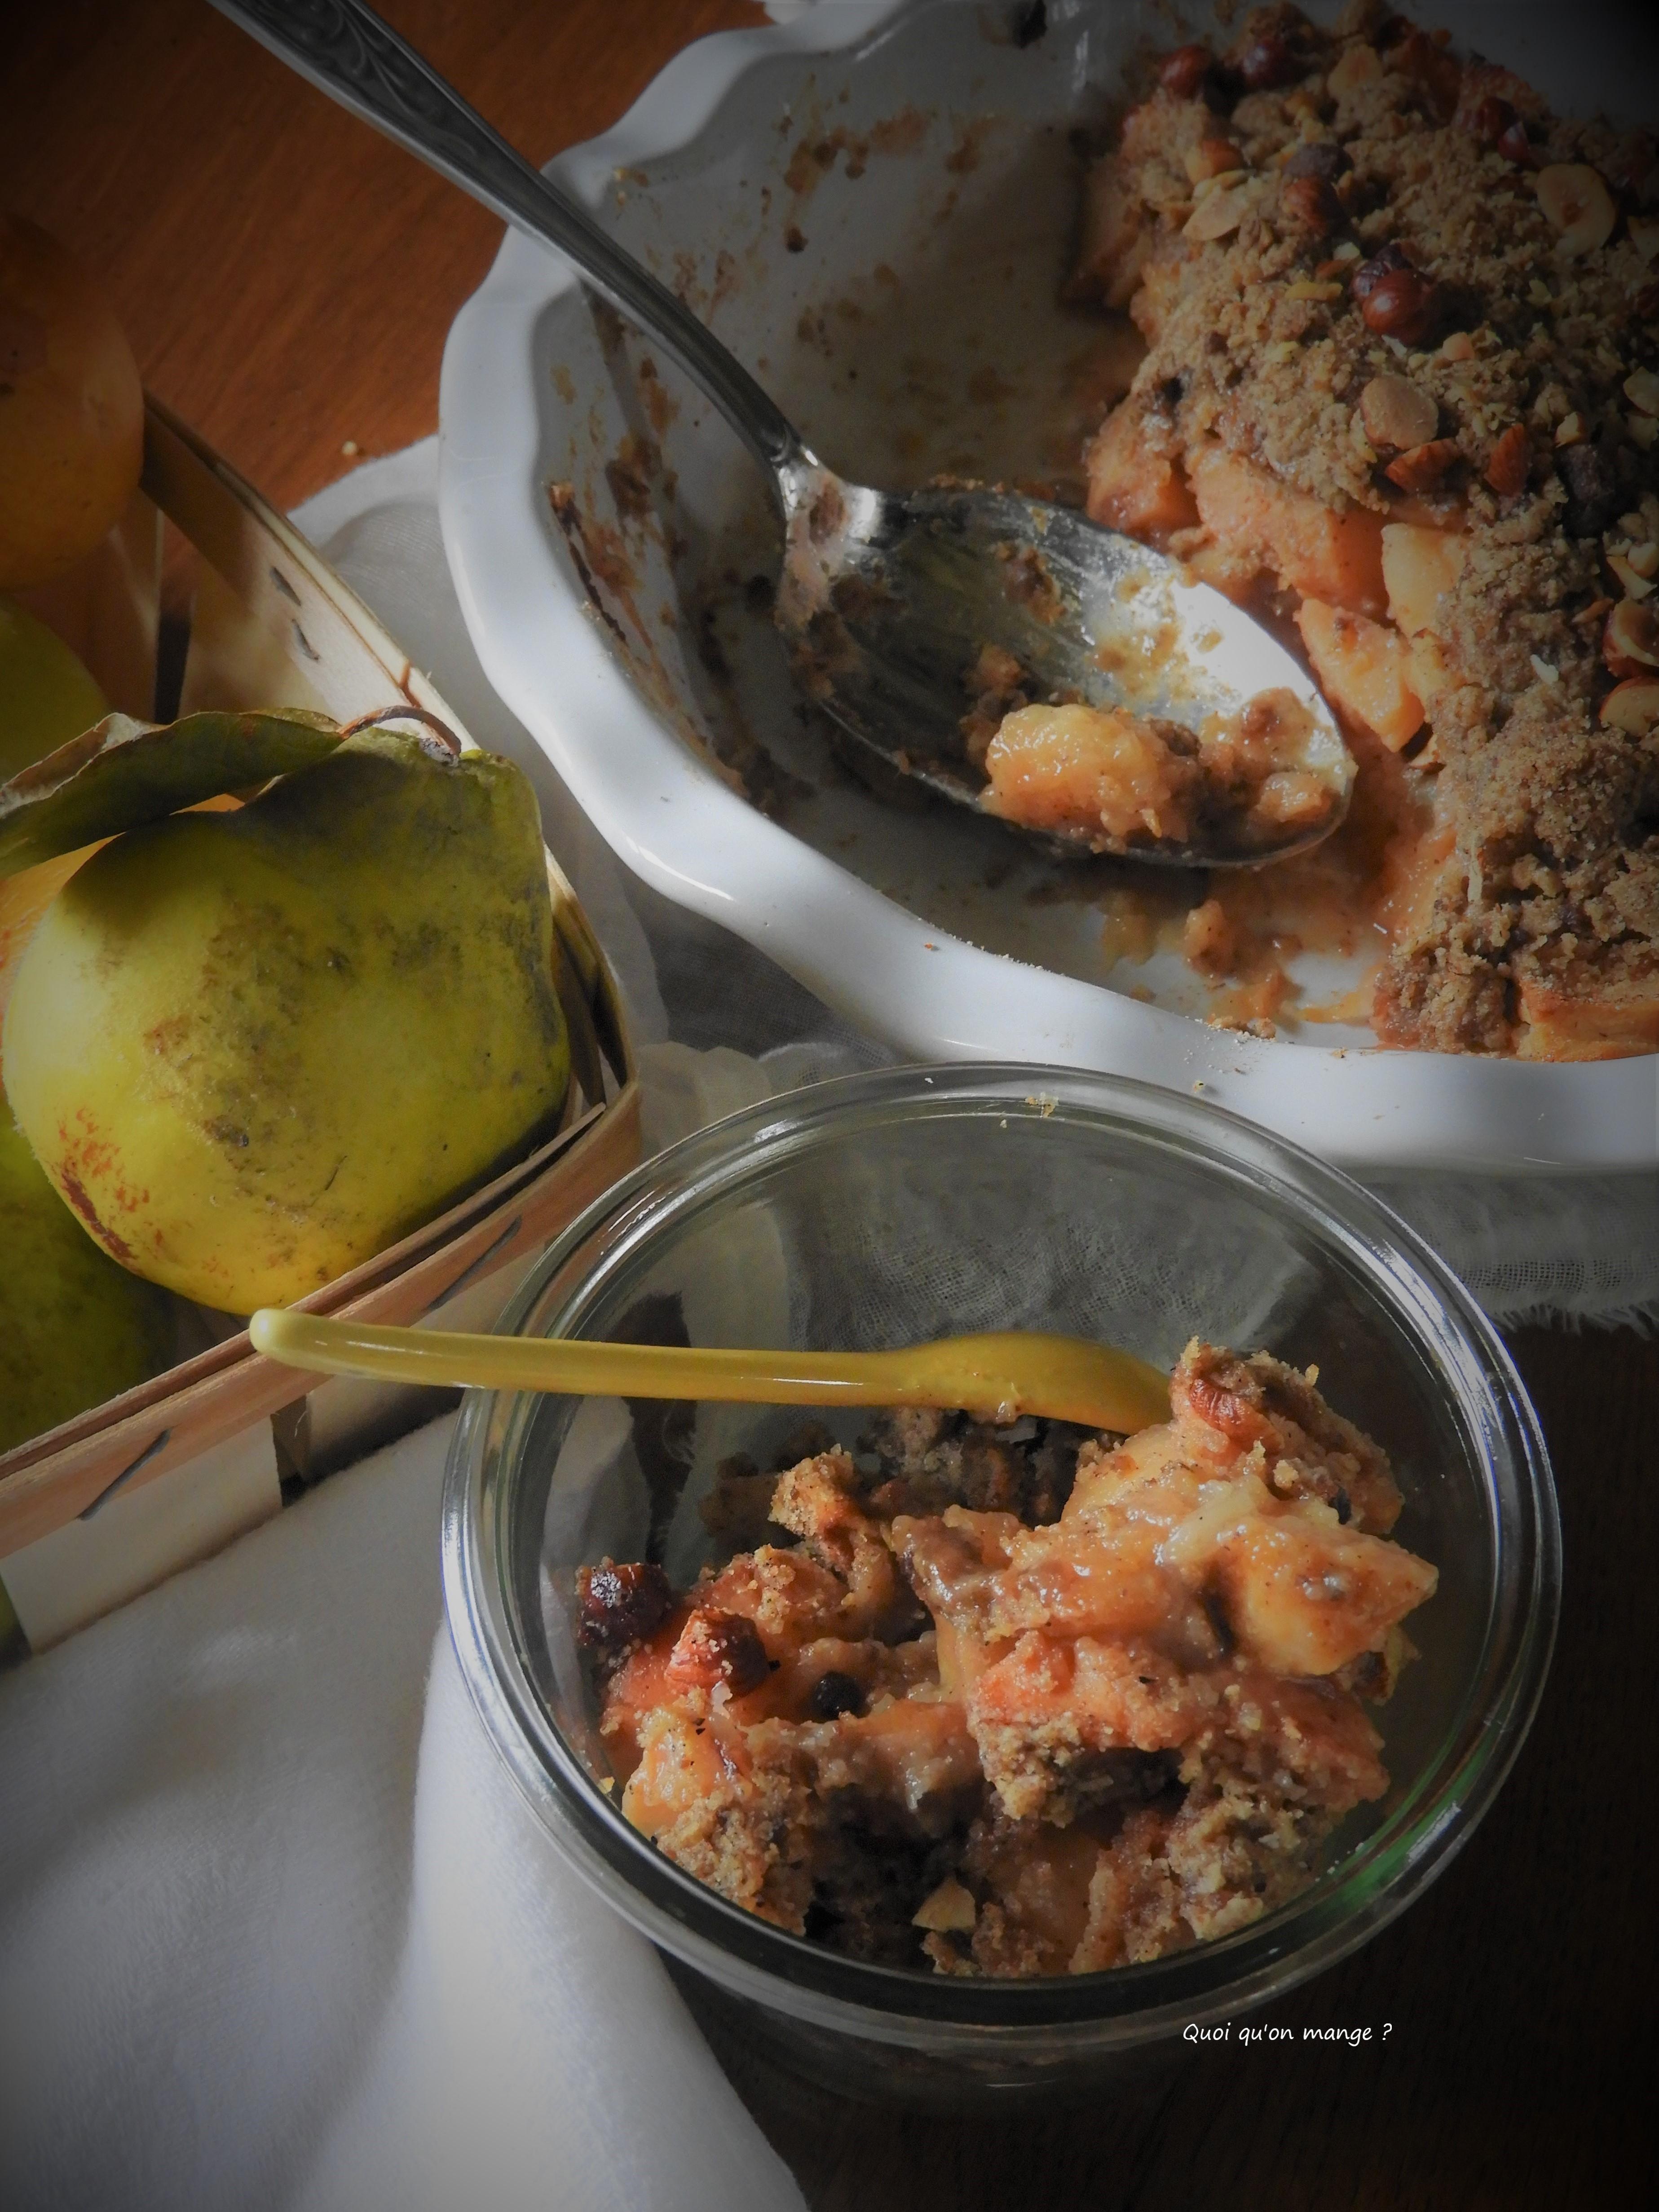 Crumble pomme et coing saveur cannelle